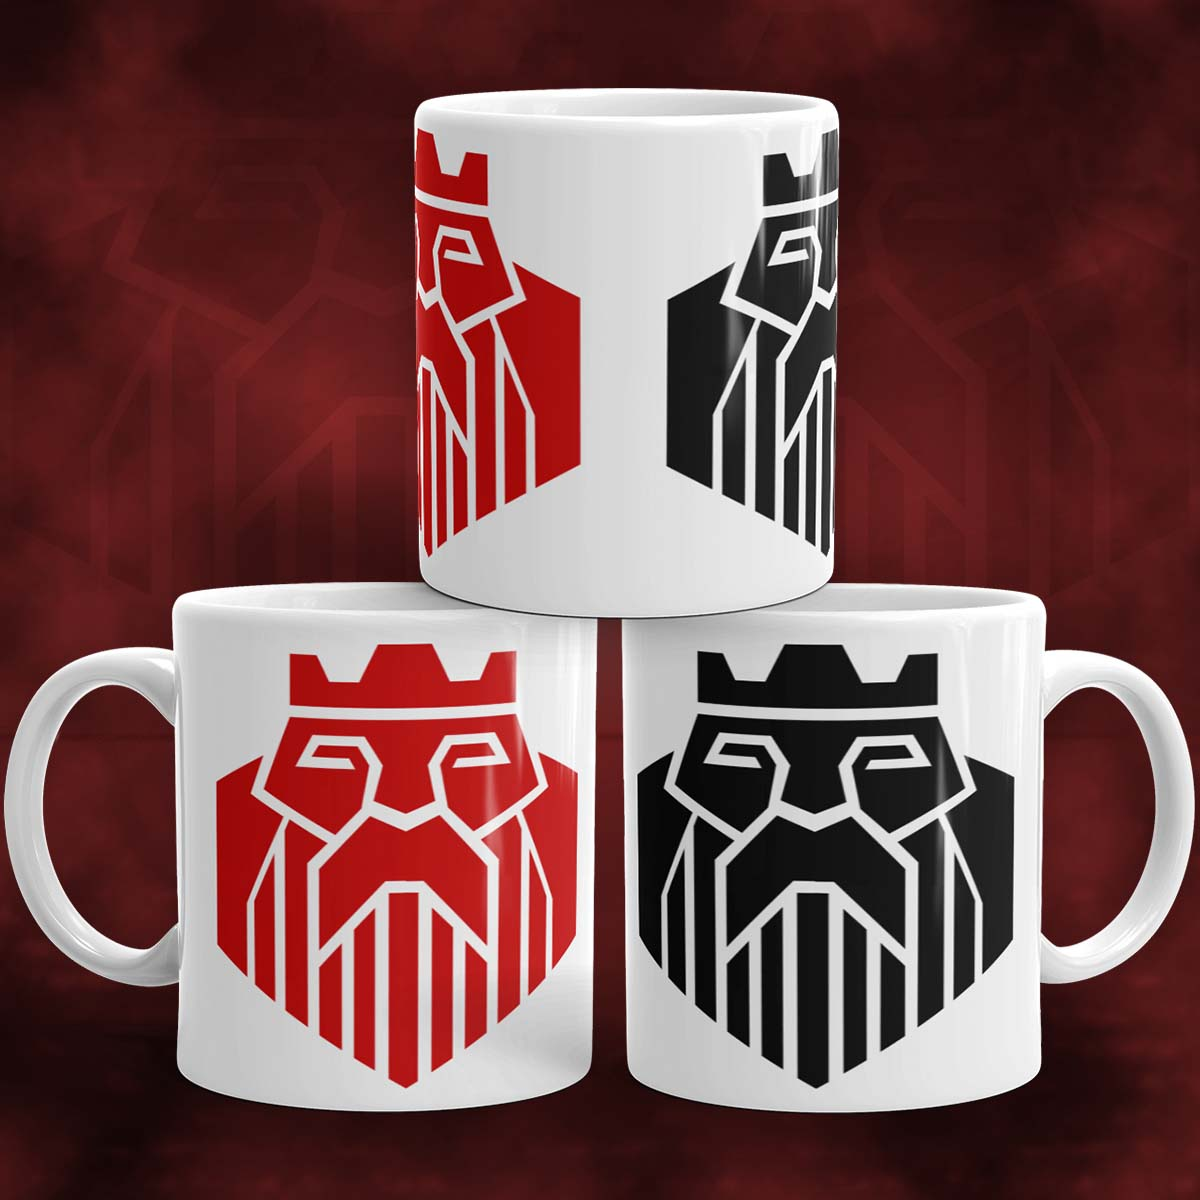 The Kings Poker Mug